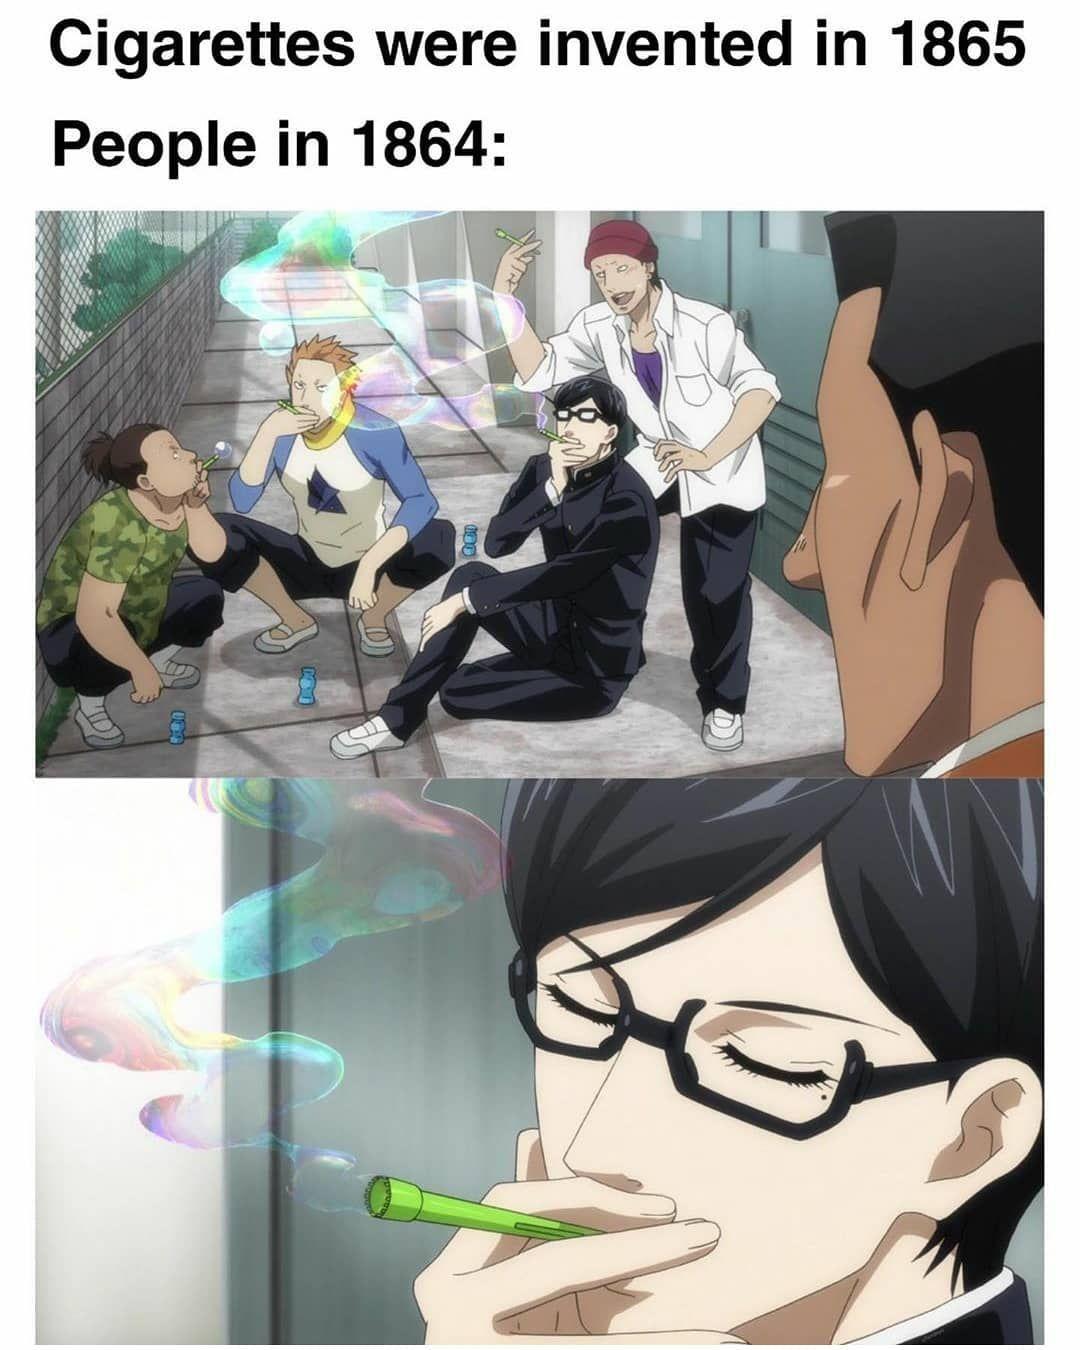 Top 10 Japanese Anime Series Otaku Anime Manga Kawaii Animegirl Japan Cosplay Naruto Animelove Animes Anime Memes Otaku Anime Memes Funny Anime Memes